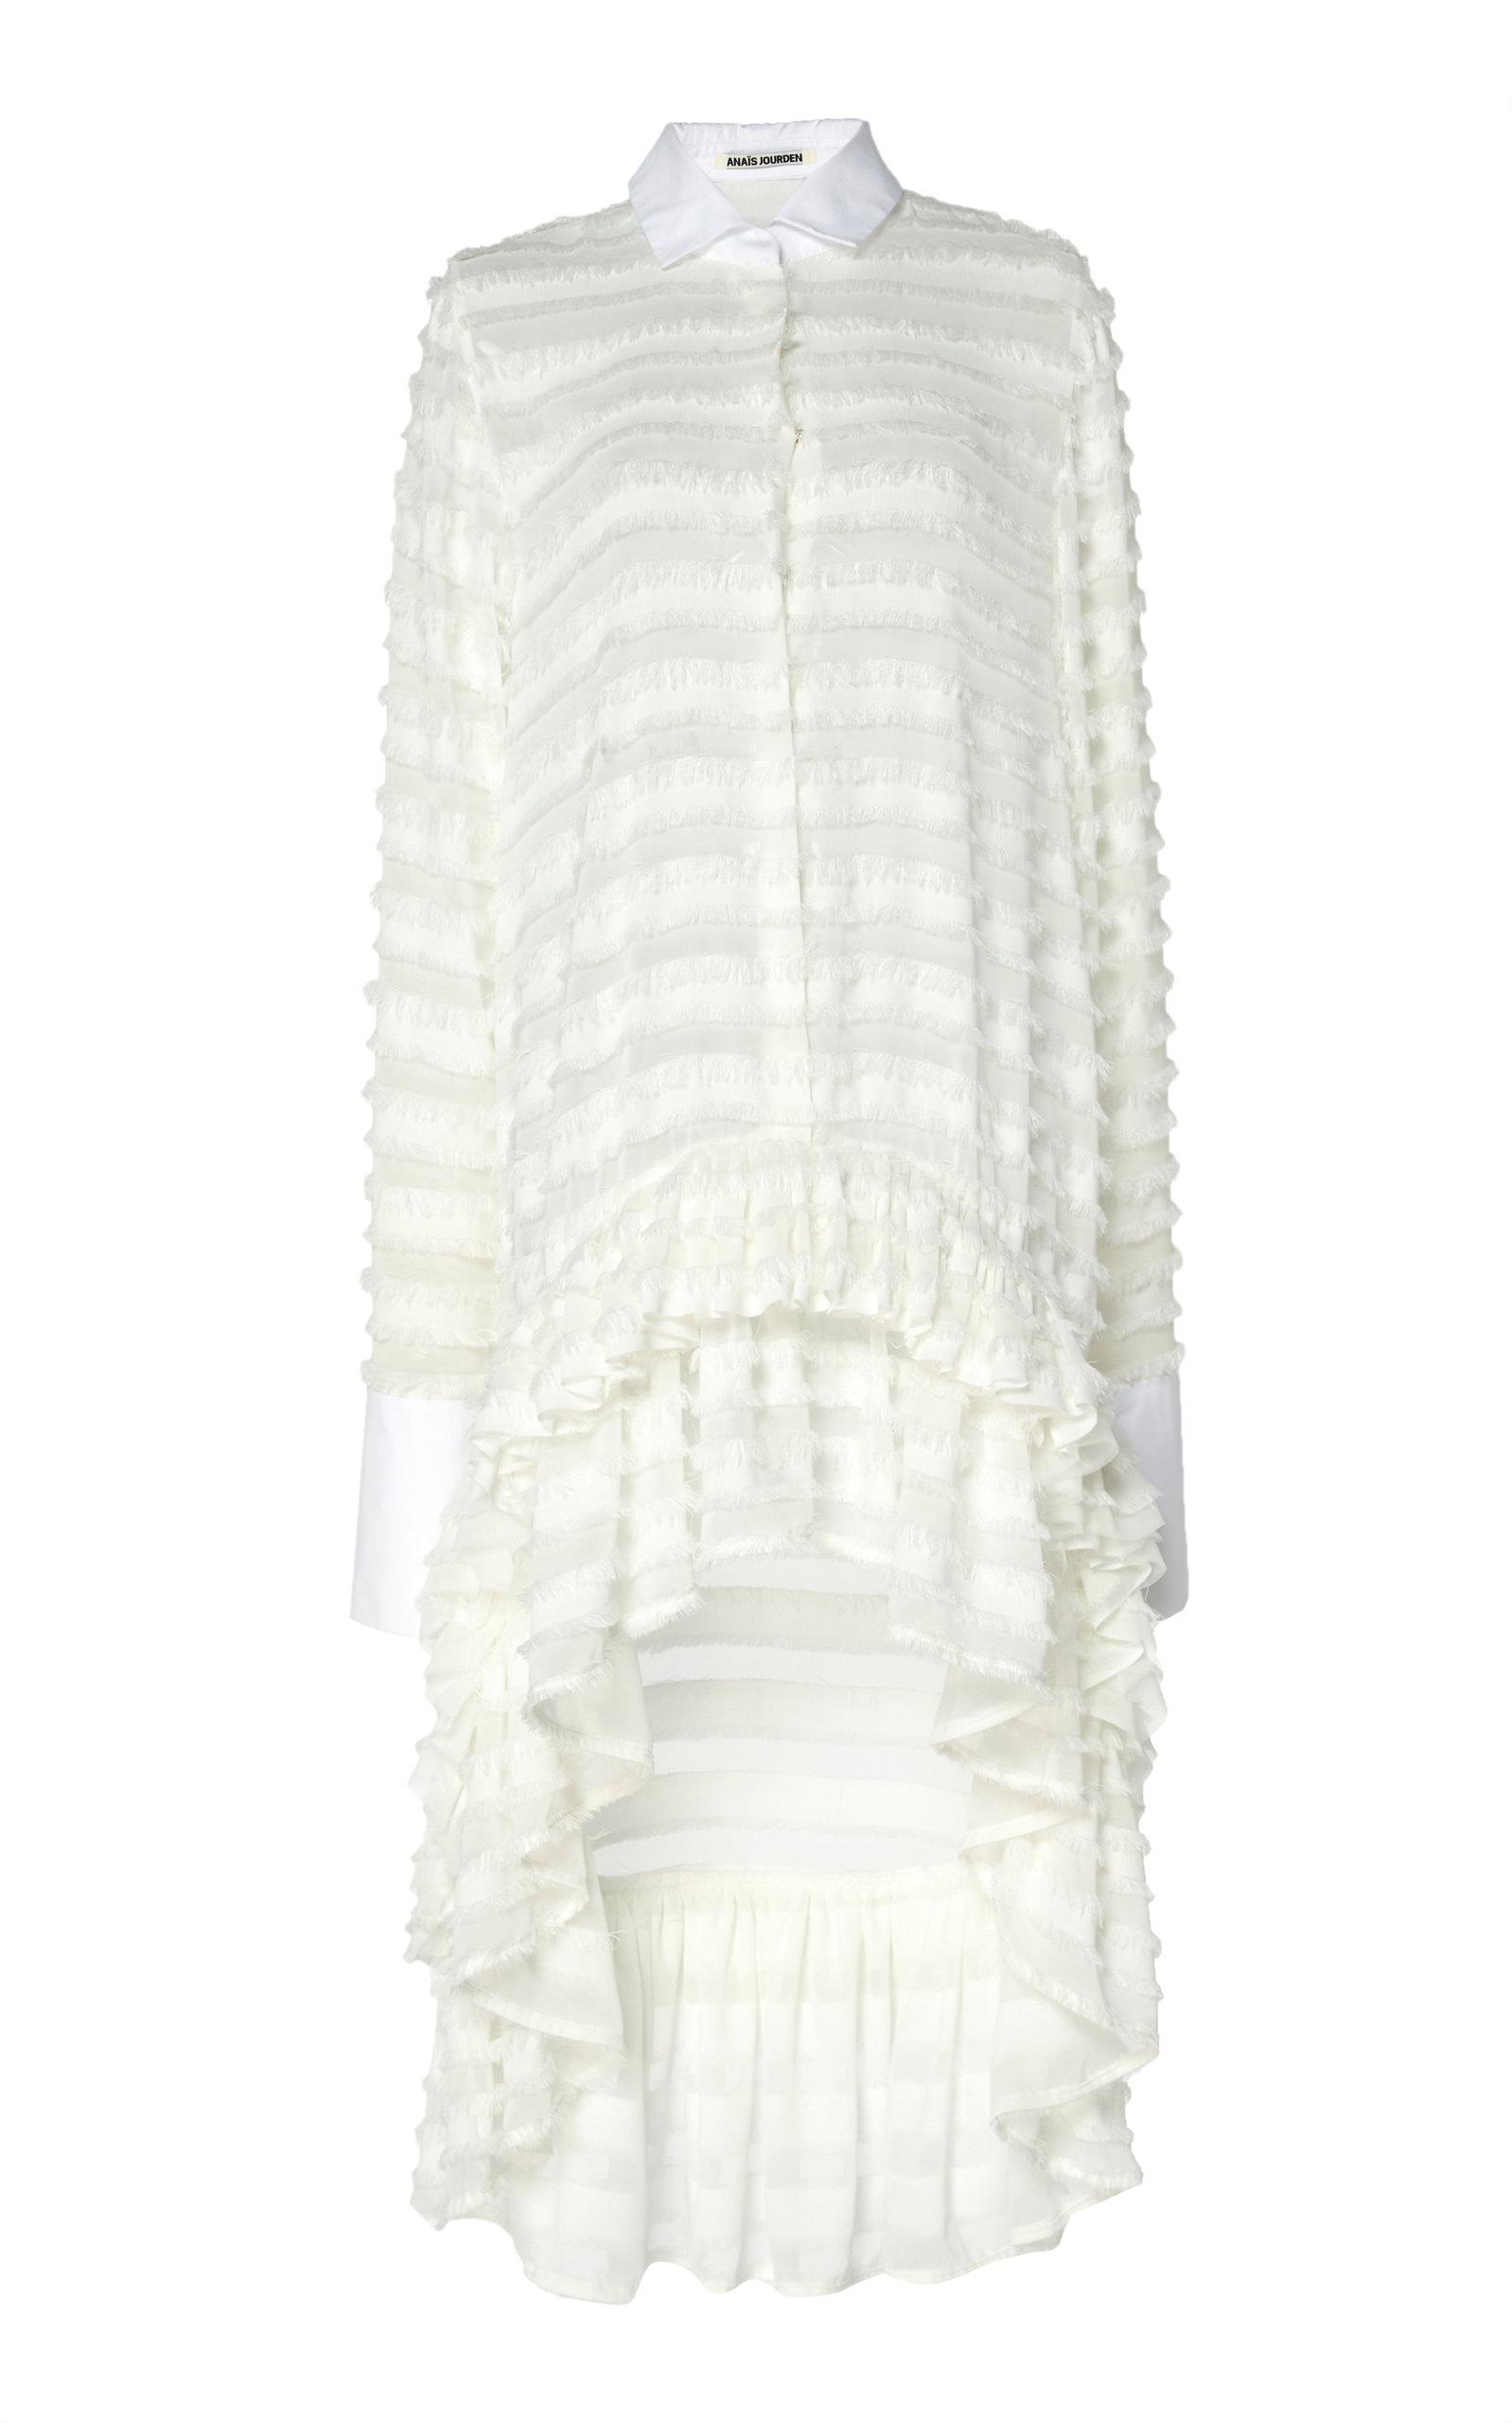 Buy Anaïs Jourden Confetti Ruffled White Tulle Shirtdress online, shop Anaïs Jourden at the best price